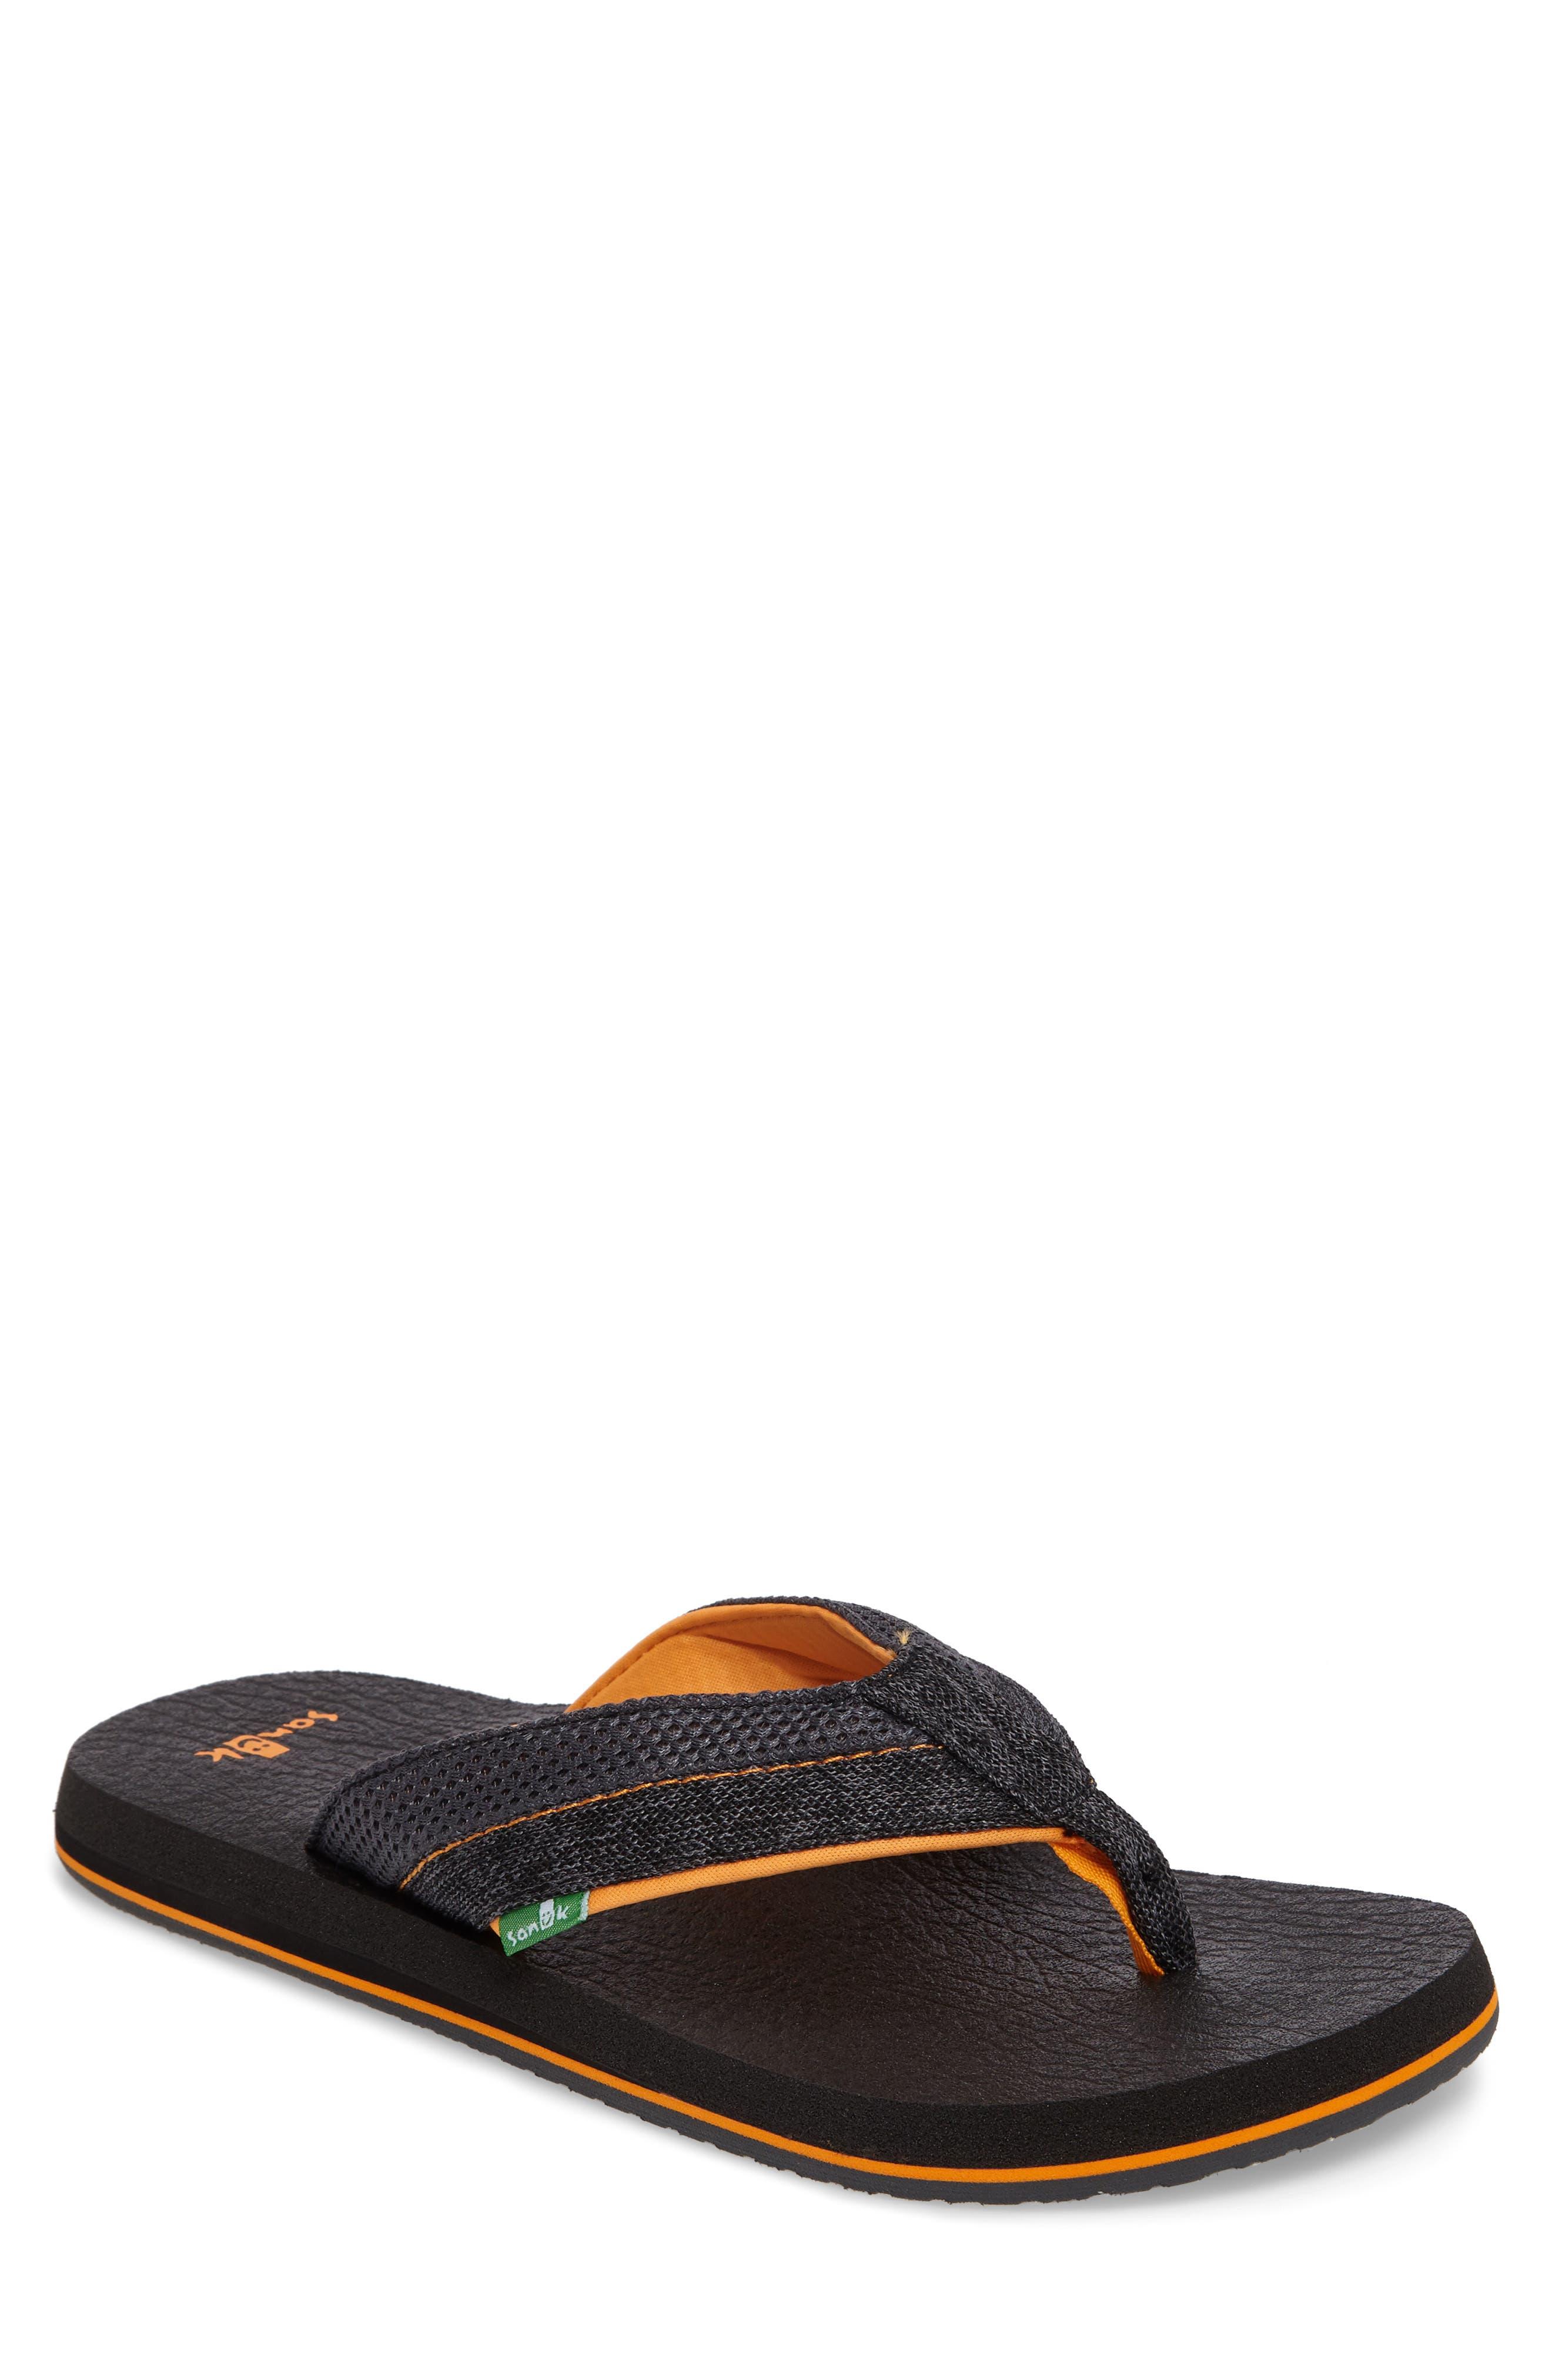 Beer Cozy Flip Flop,                         Main,                         color, Black/ Charcoal/ Orange